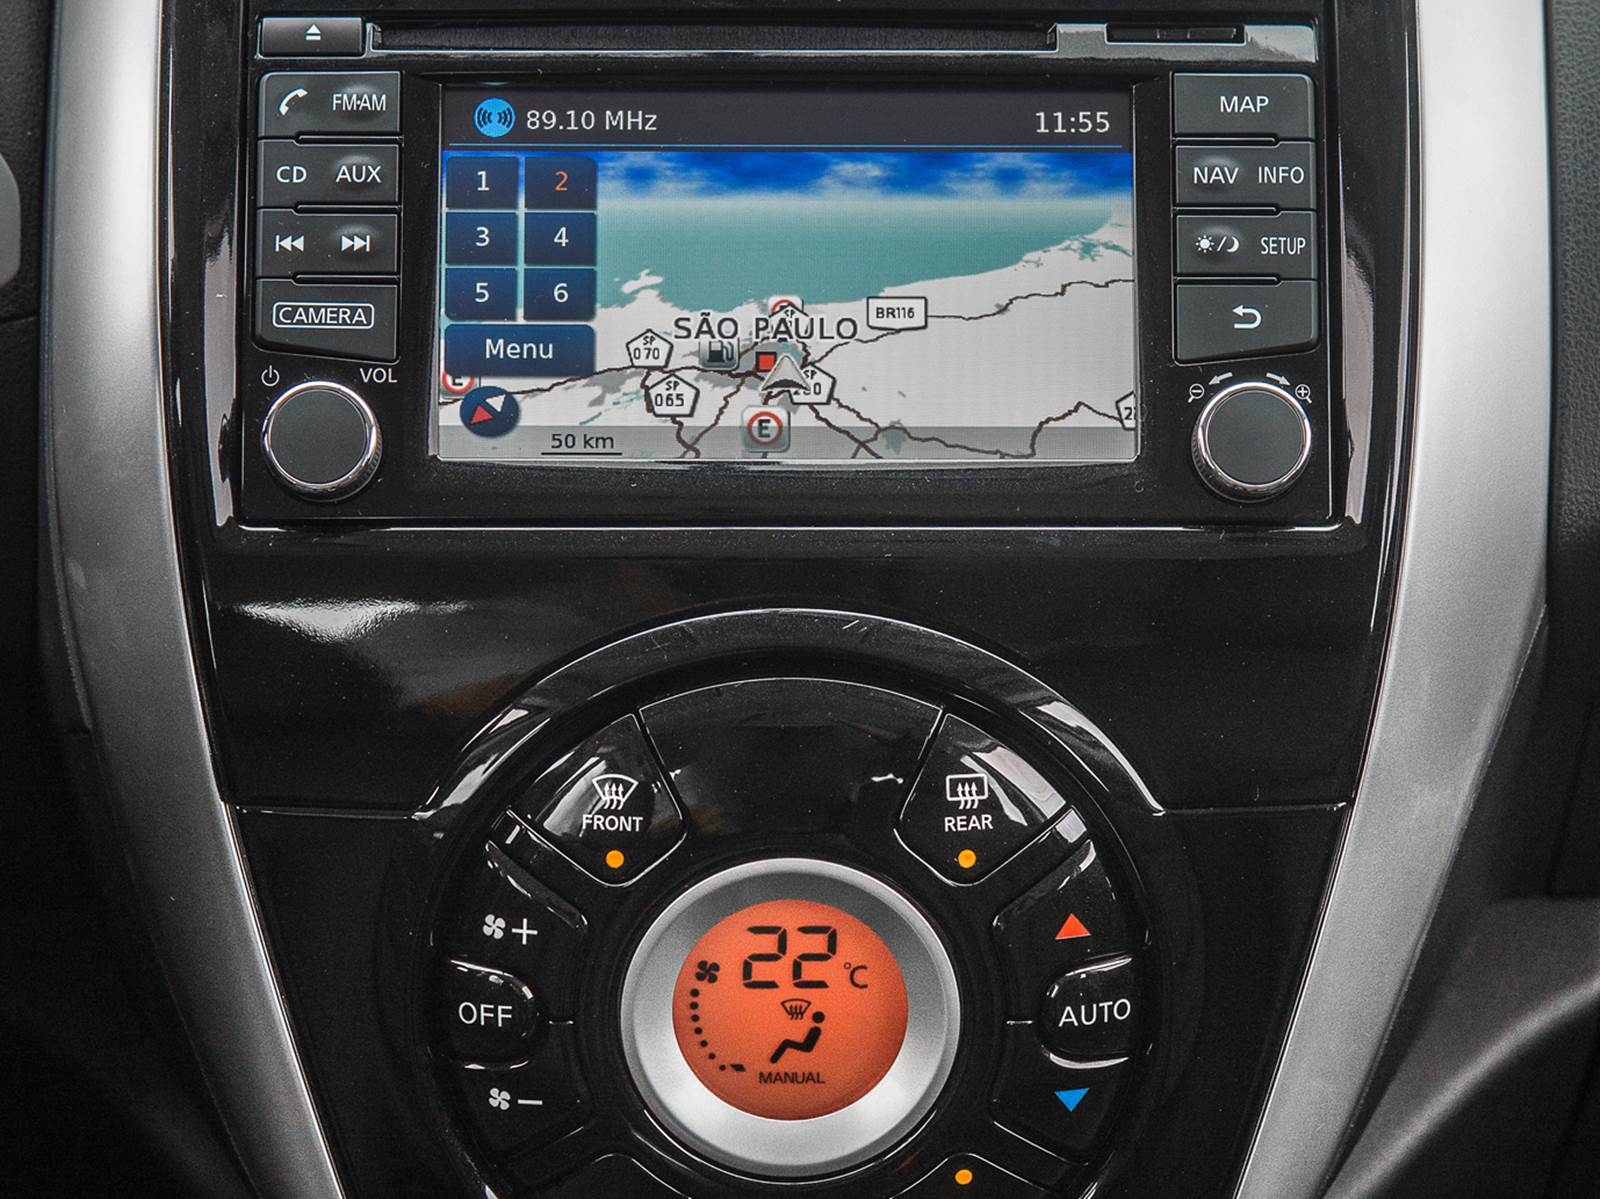 Novo Nissan Versa 2016 - central multimídia com GPS